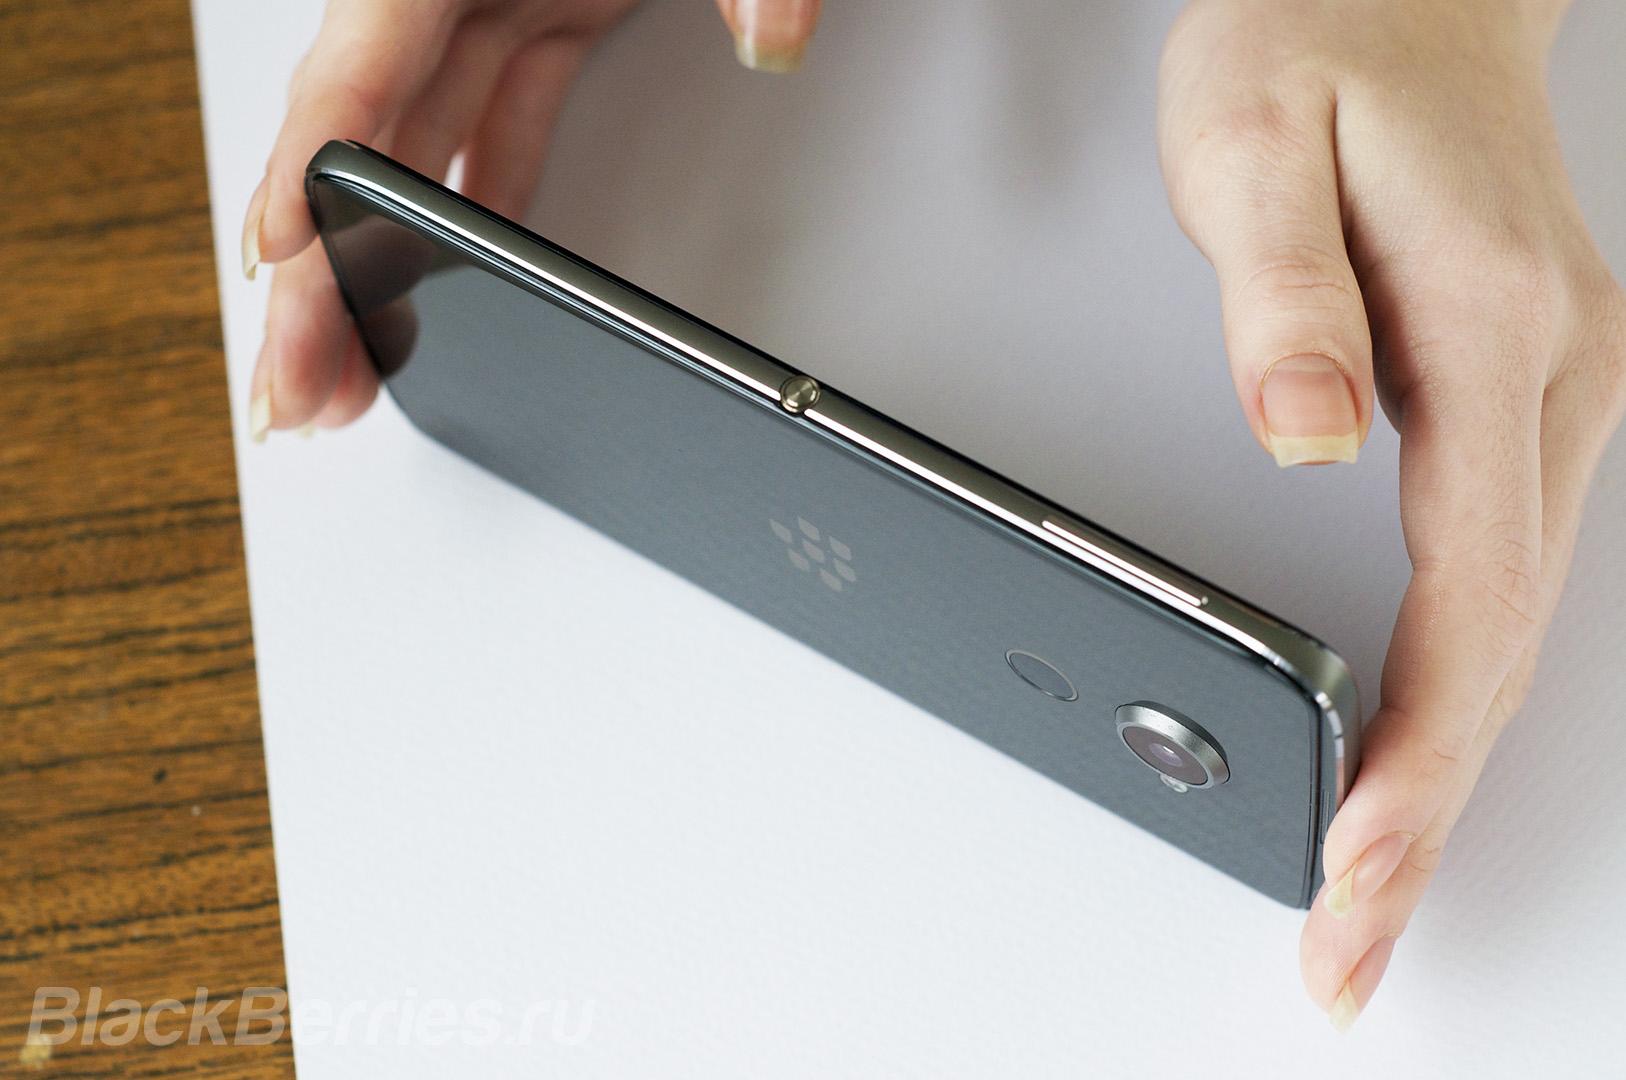 blackberry-dtek60-review-60